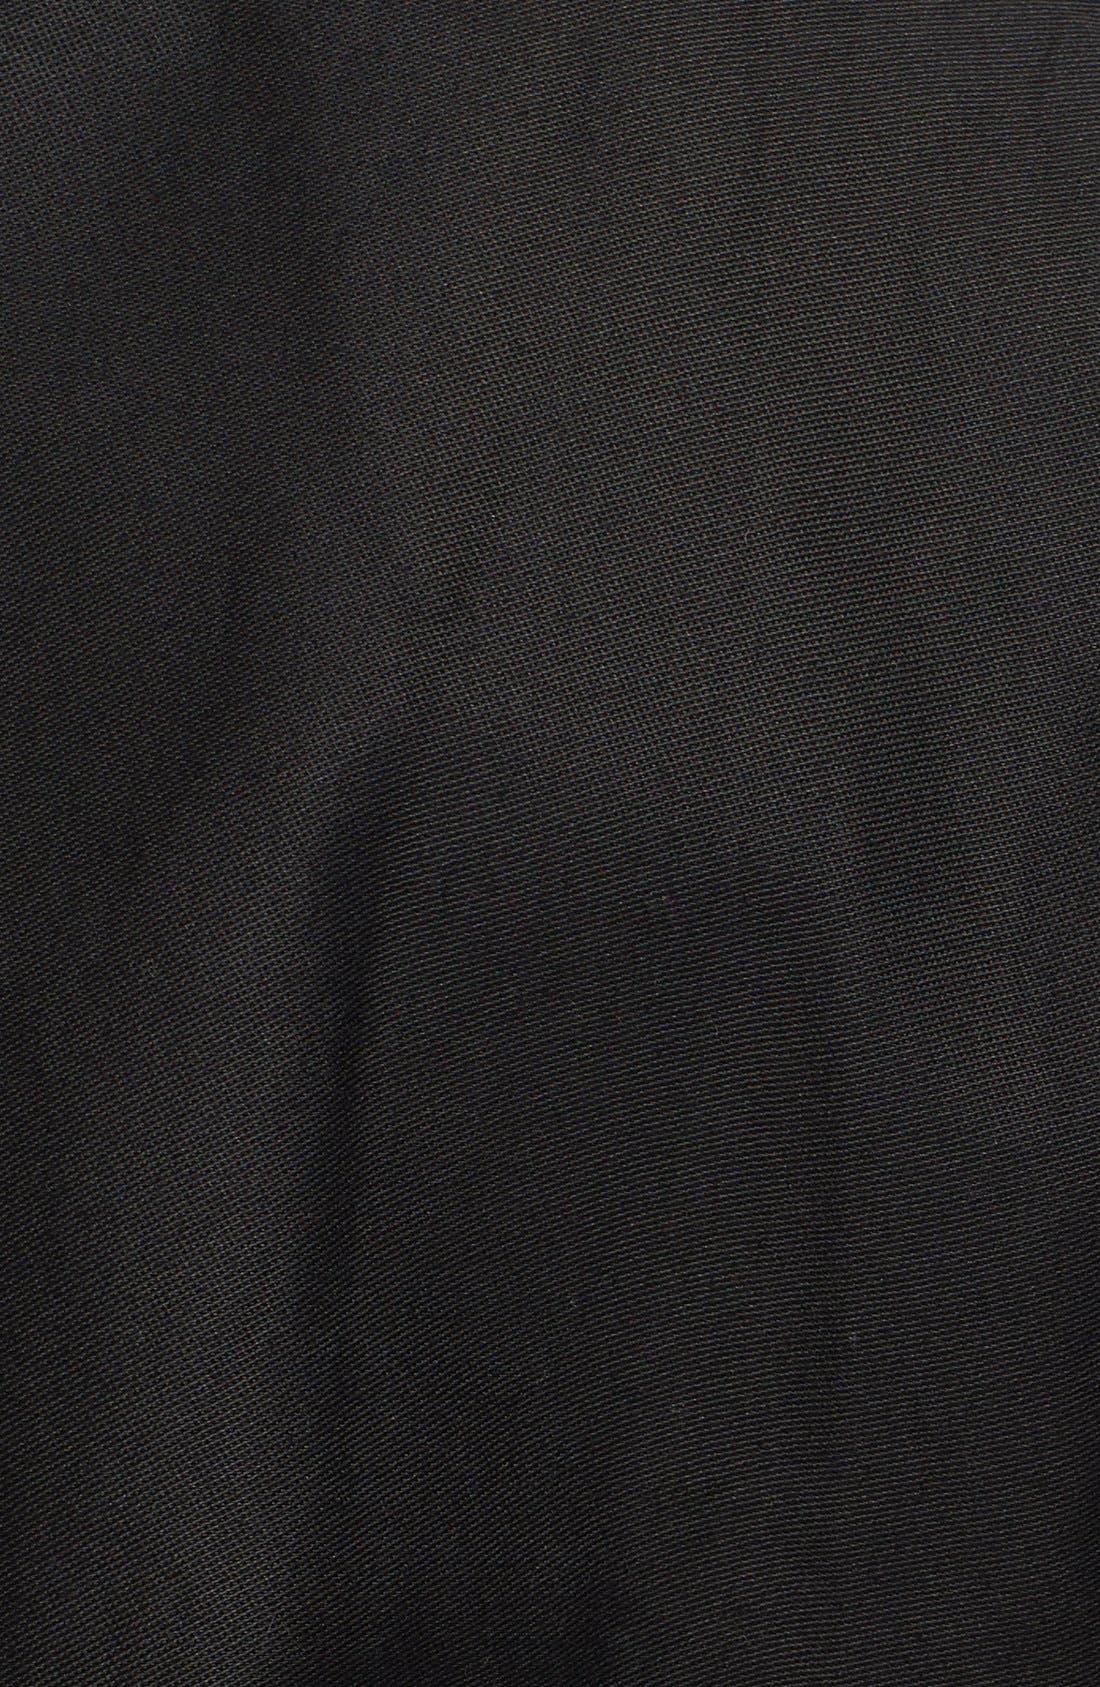 Alternate Image 3  - G-Star Raw Cotton Canvas Shirt Jacket